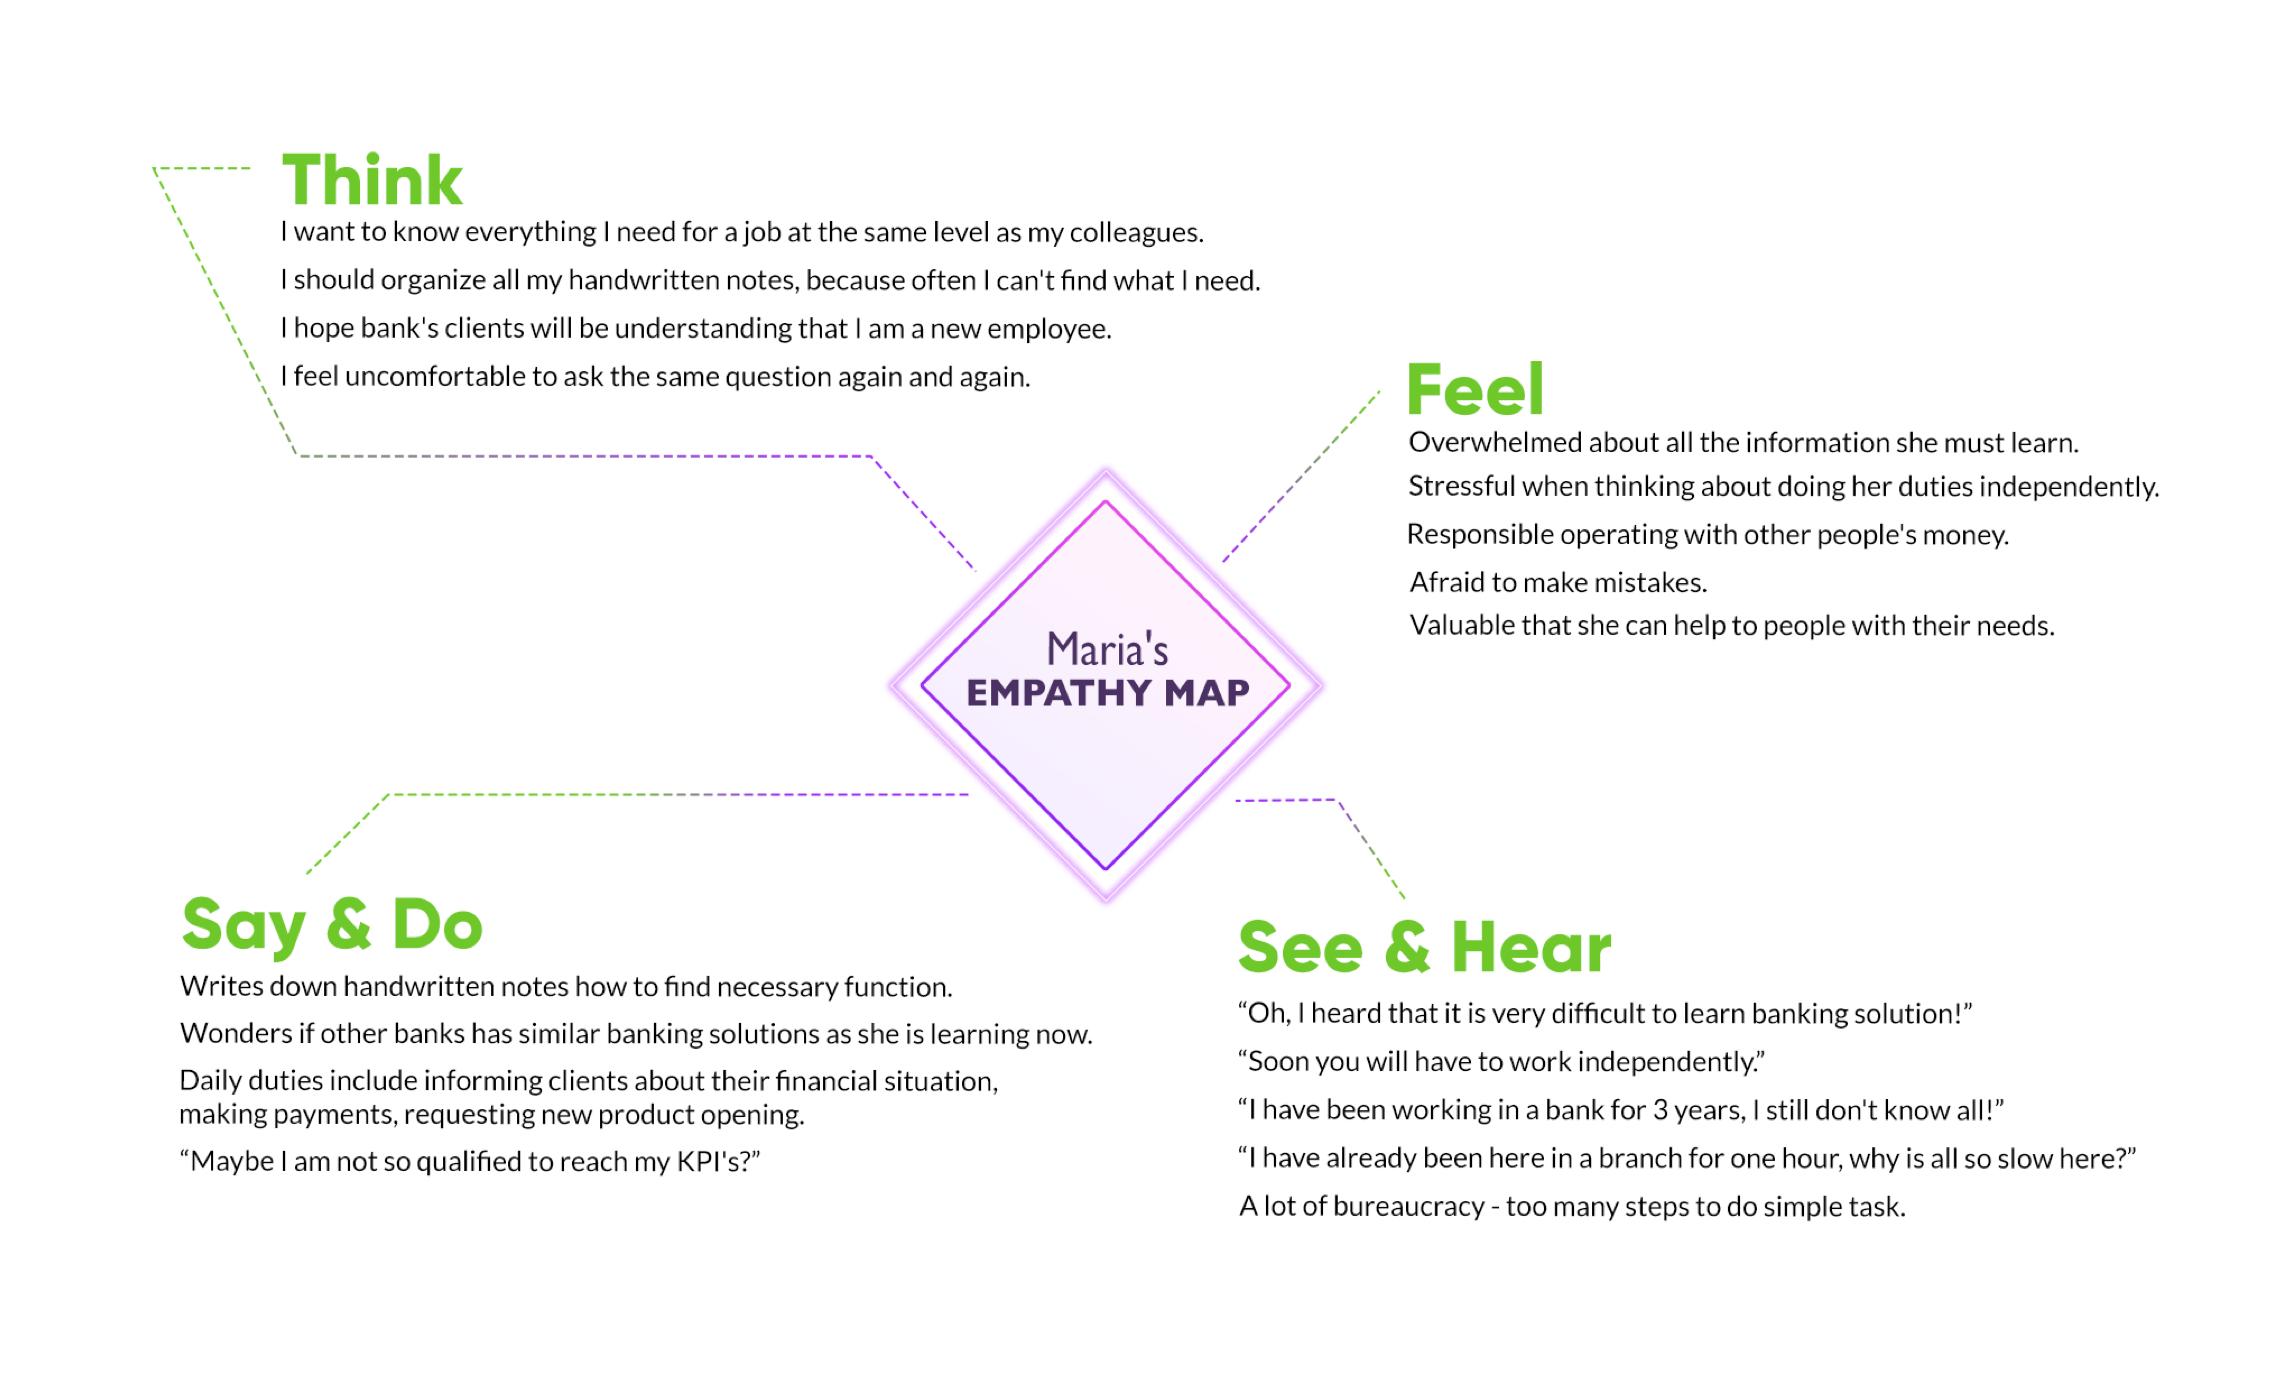 empathy-map-banking-ux-itti-digital-L-1-1603181207.jpg